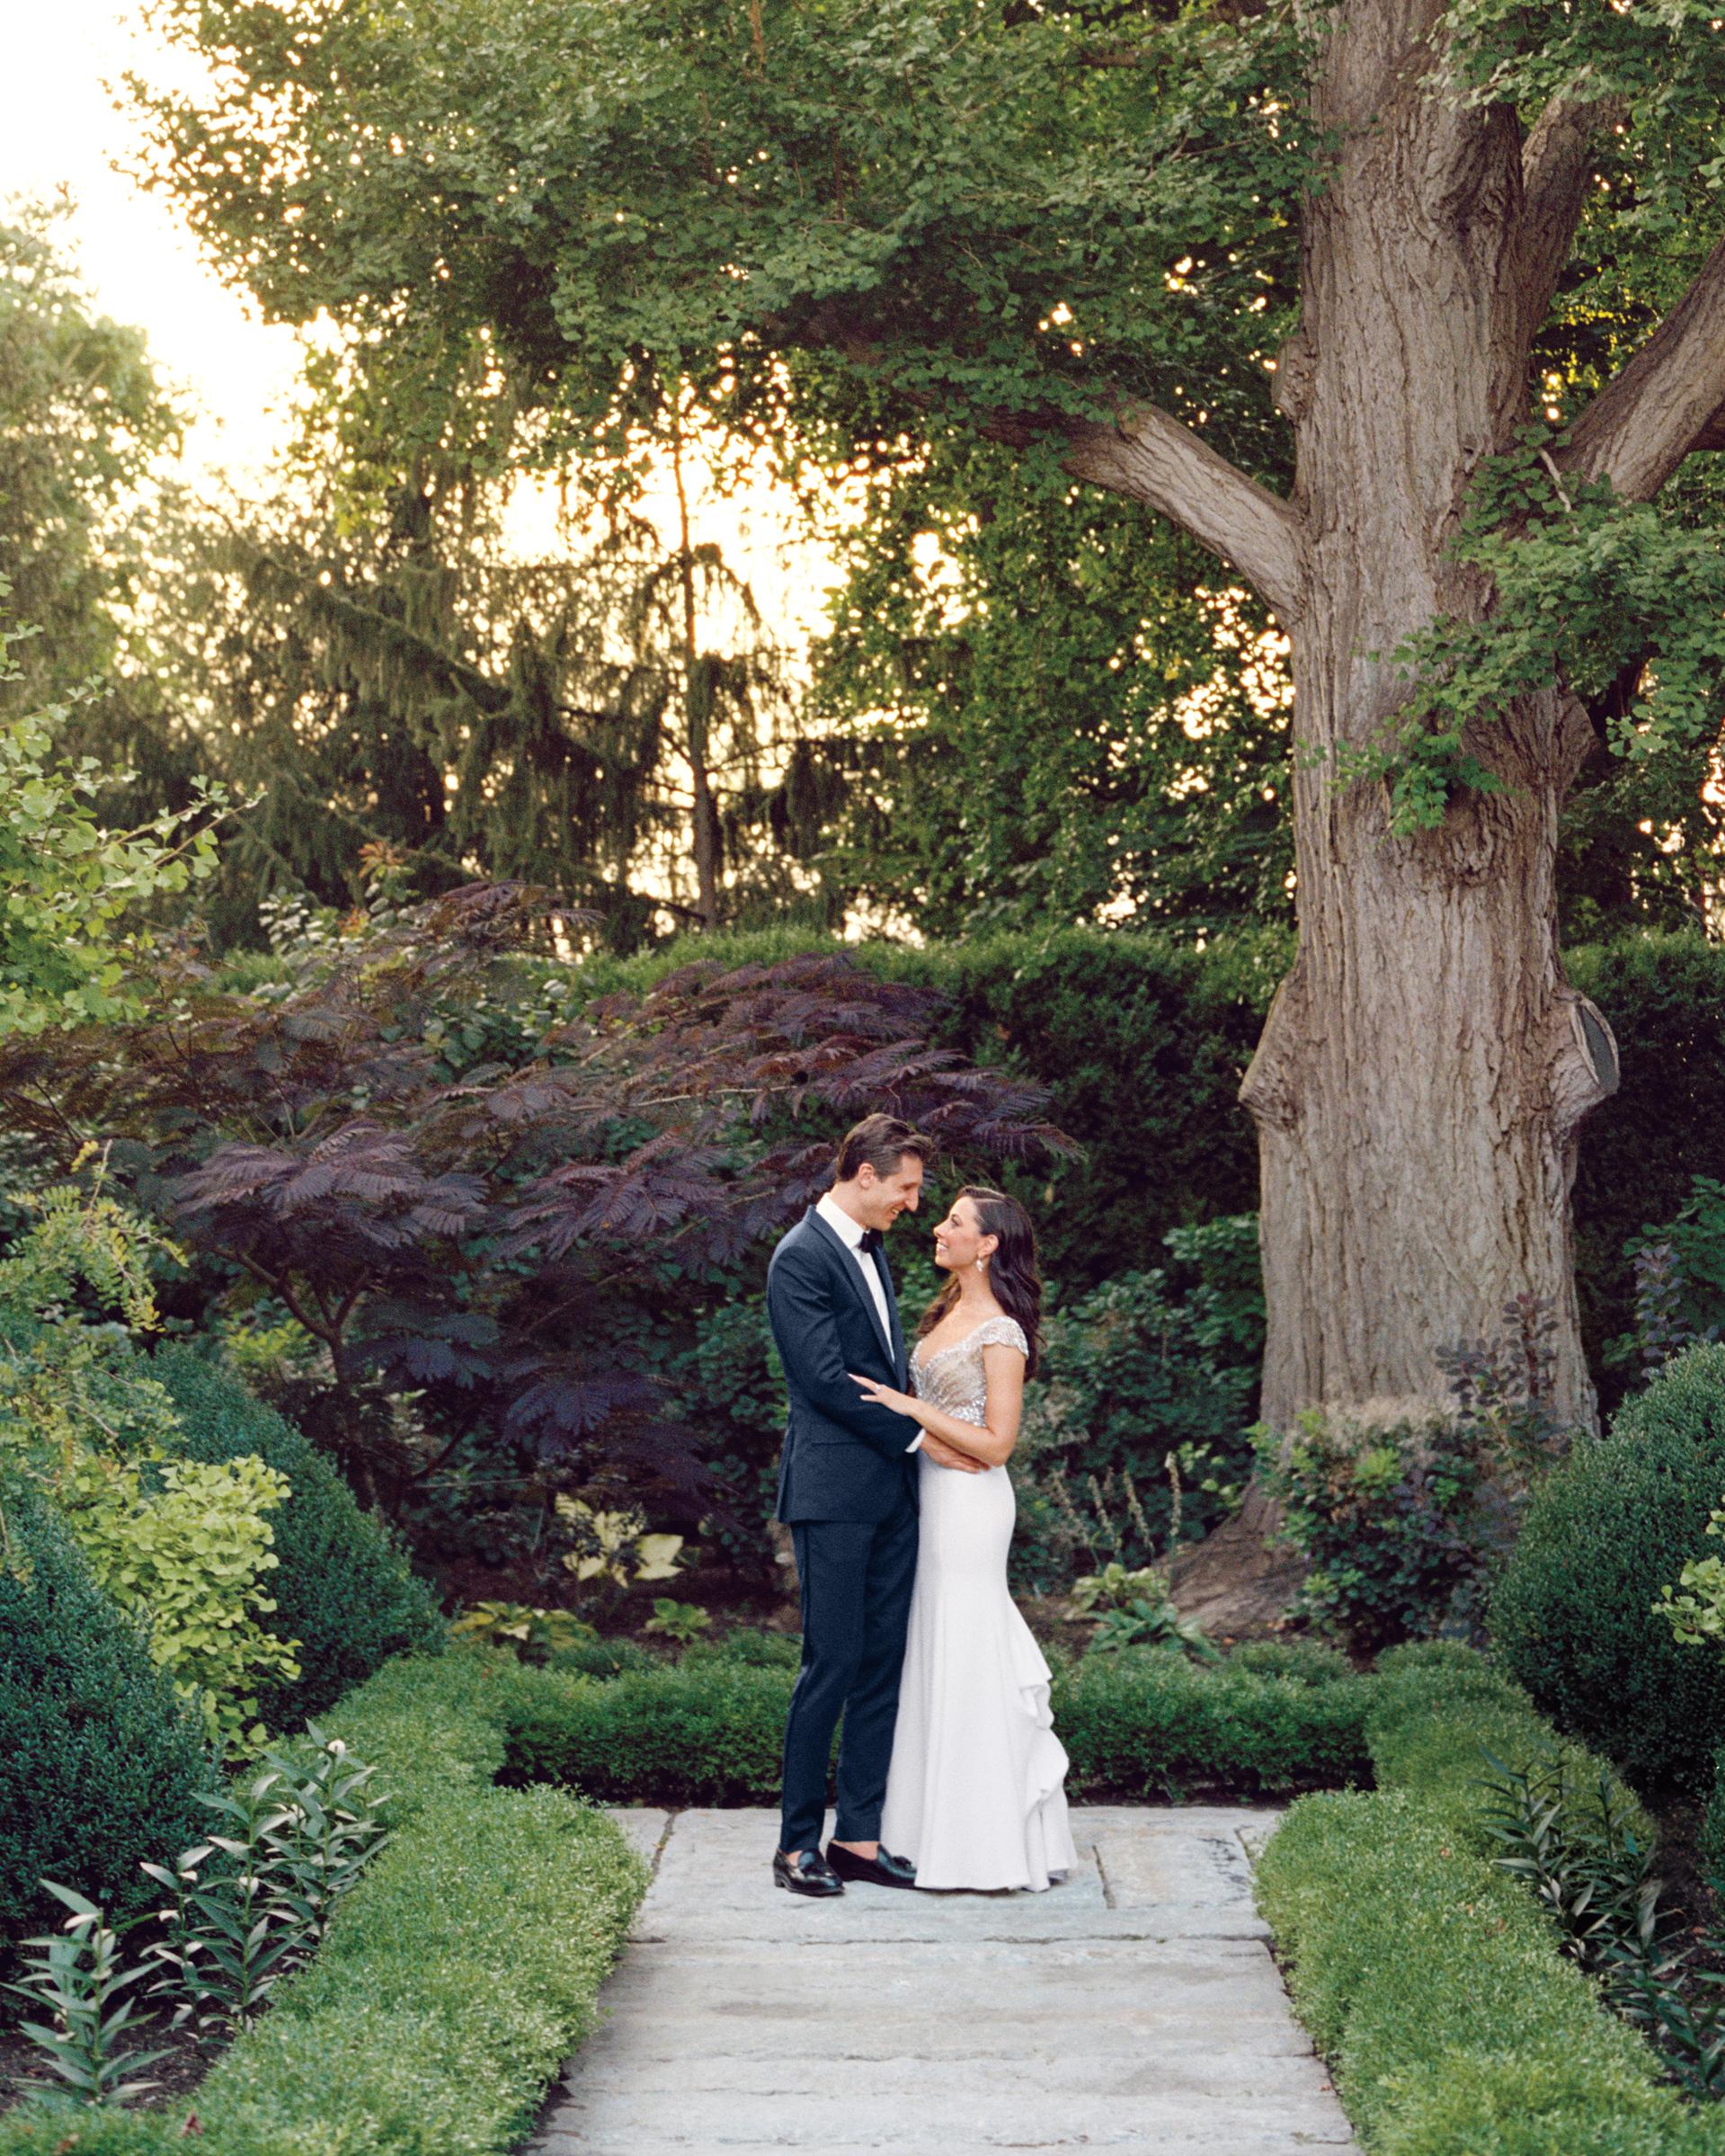 kristina-barrett-wedding-martha-farm-c20211-13b-59-d112650.jpg